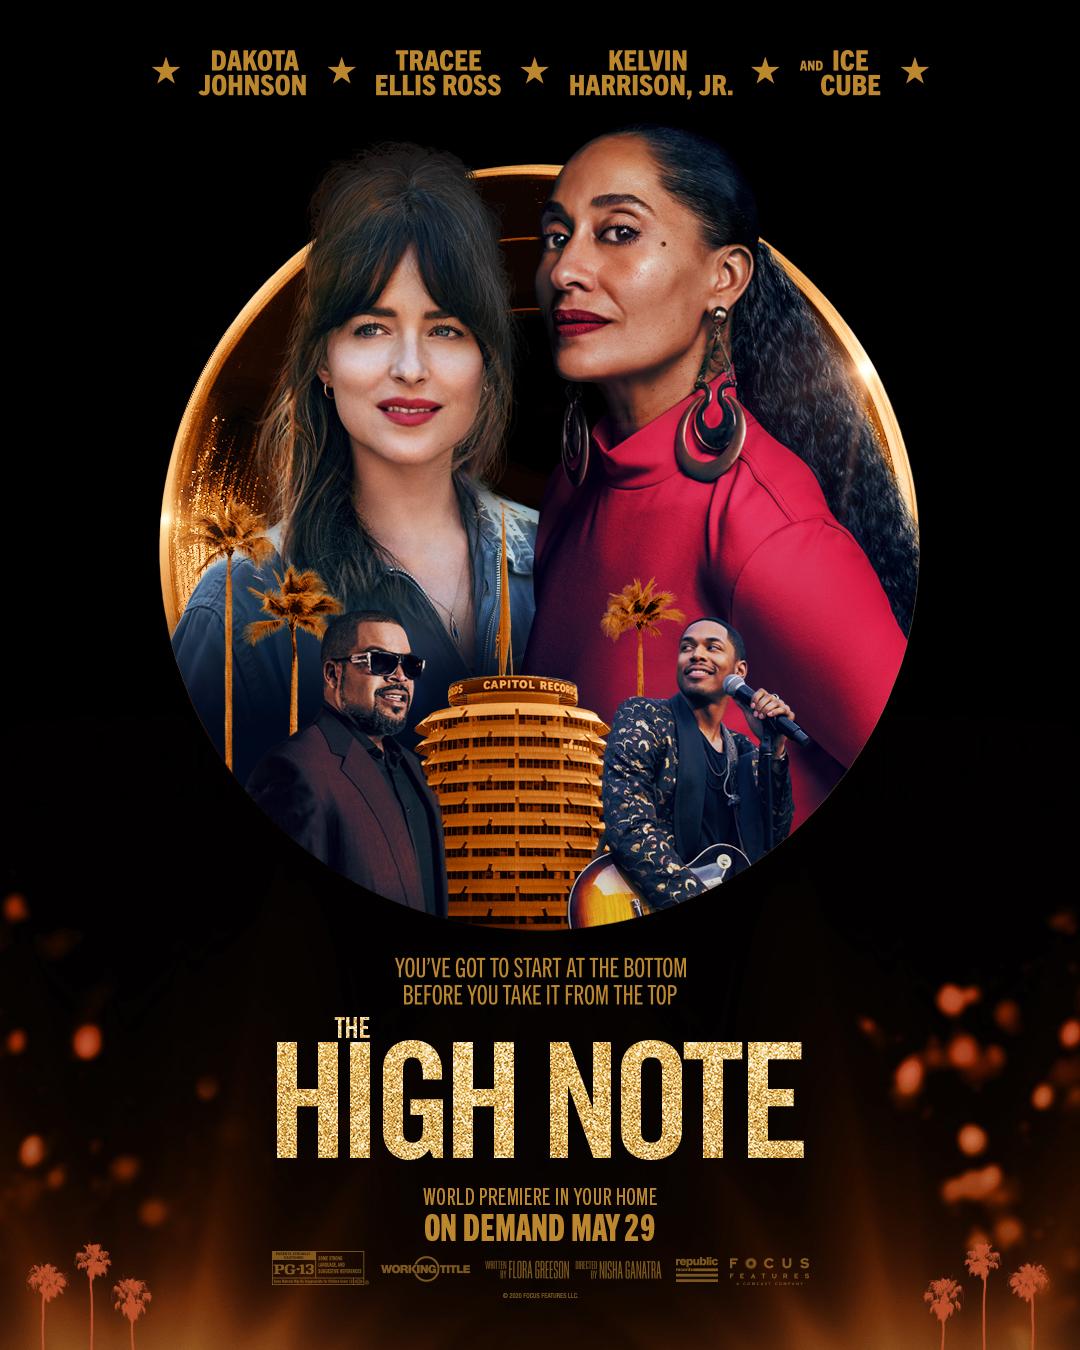 The High Note key art